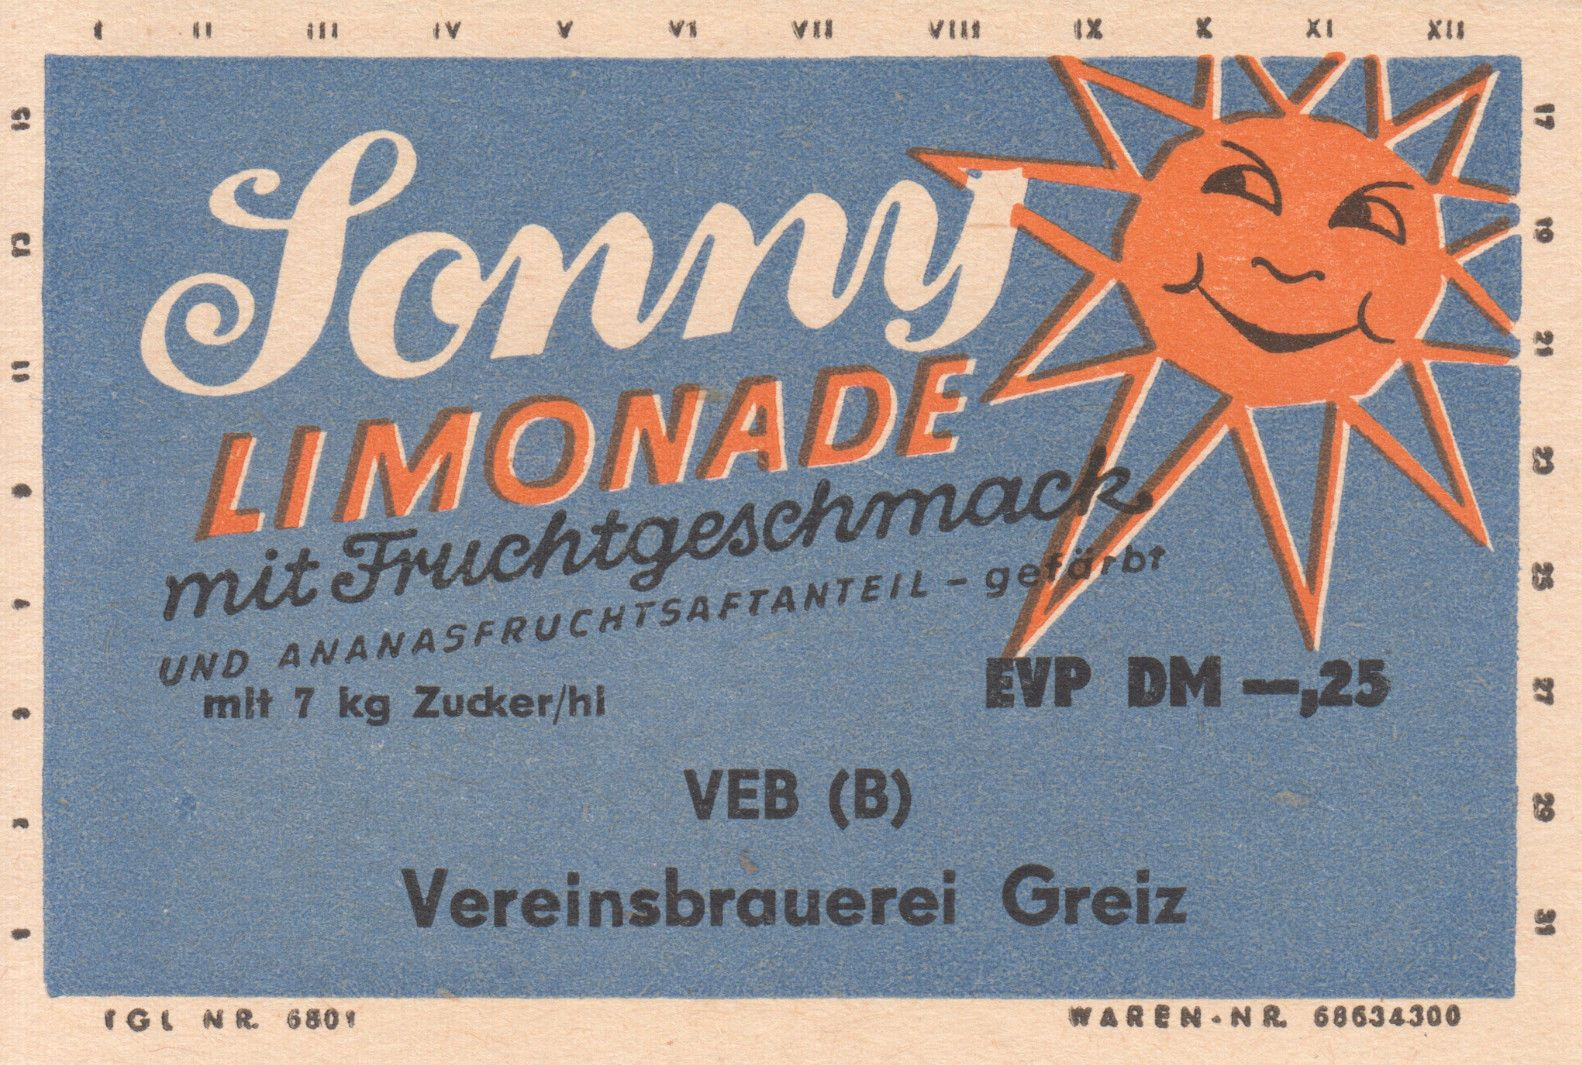 Sonny Limonade, VEB (B) Vereinsbrauerei Greiz (Bild: historisches Etikett)